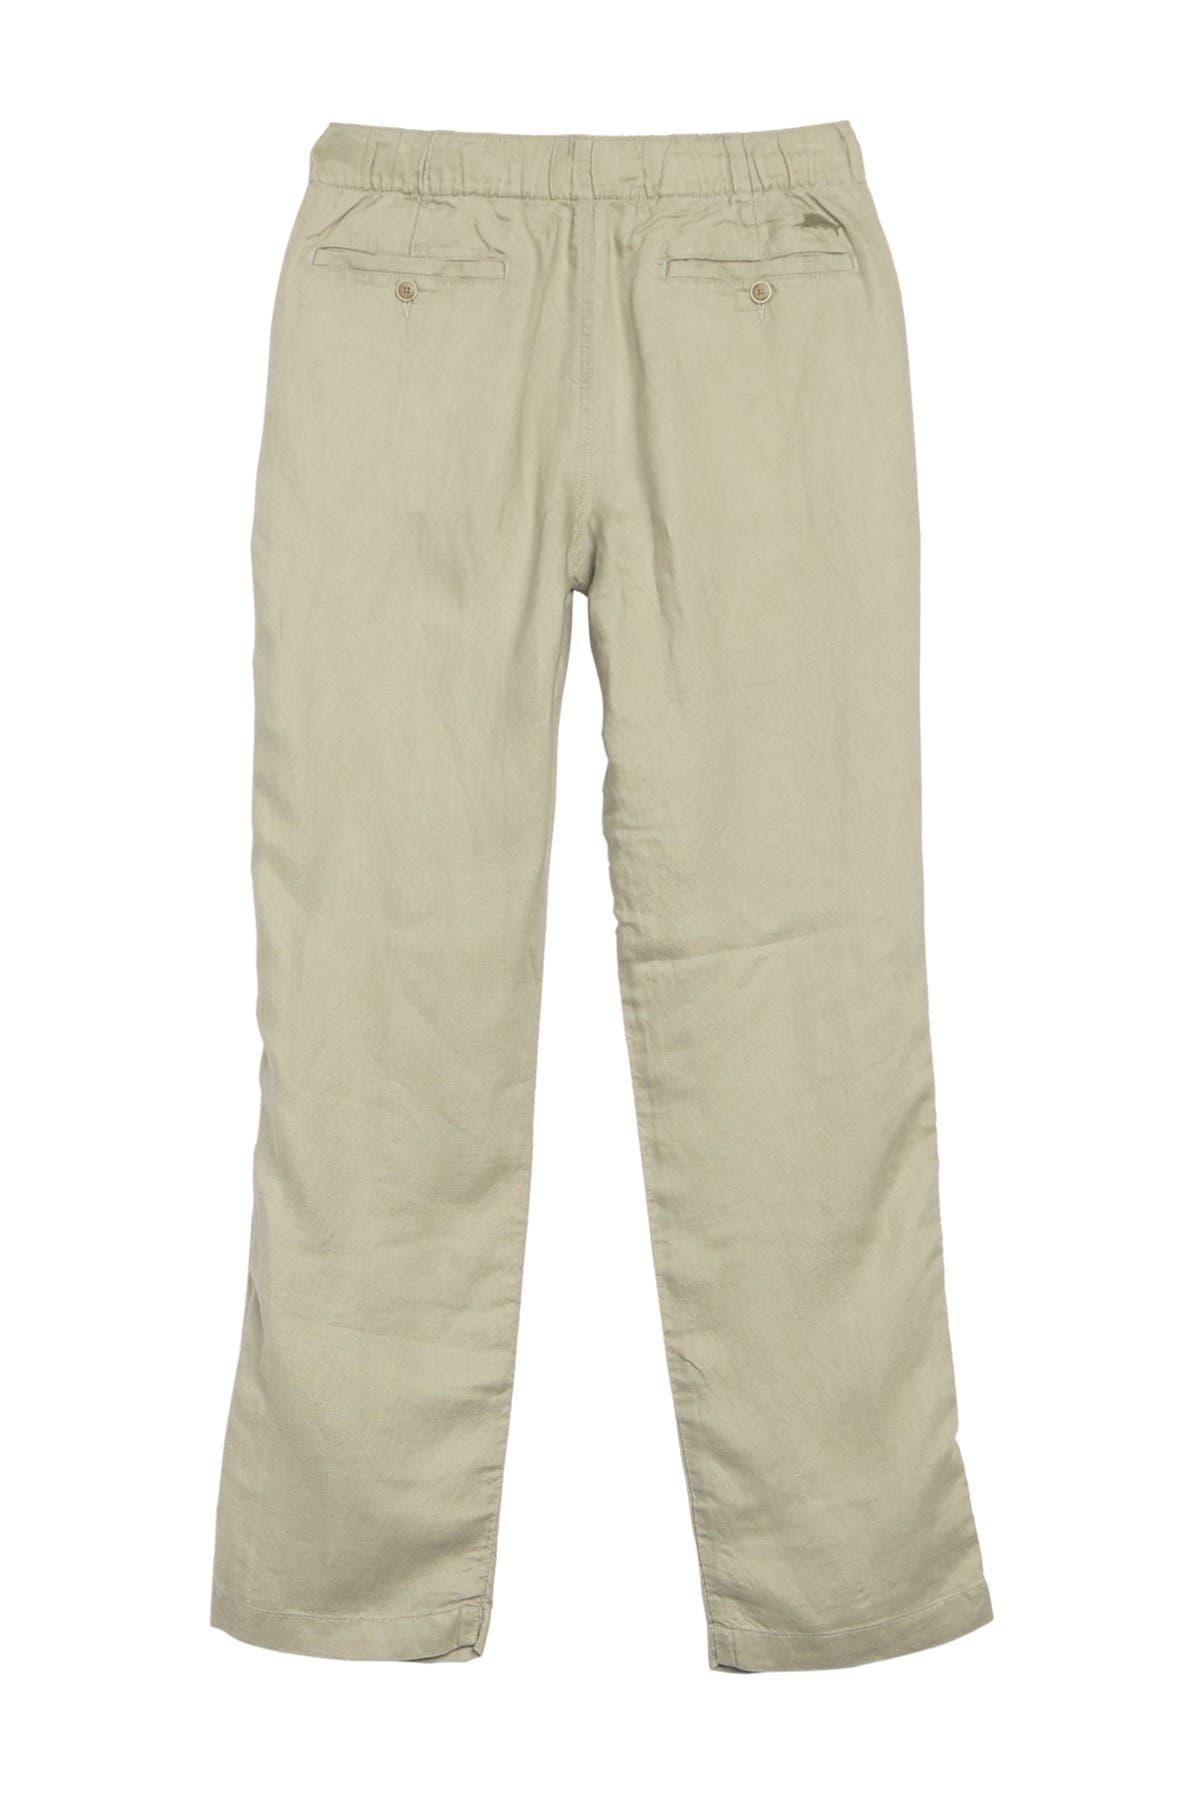 Tommy Bahama Linen Blend Dreamin Pants